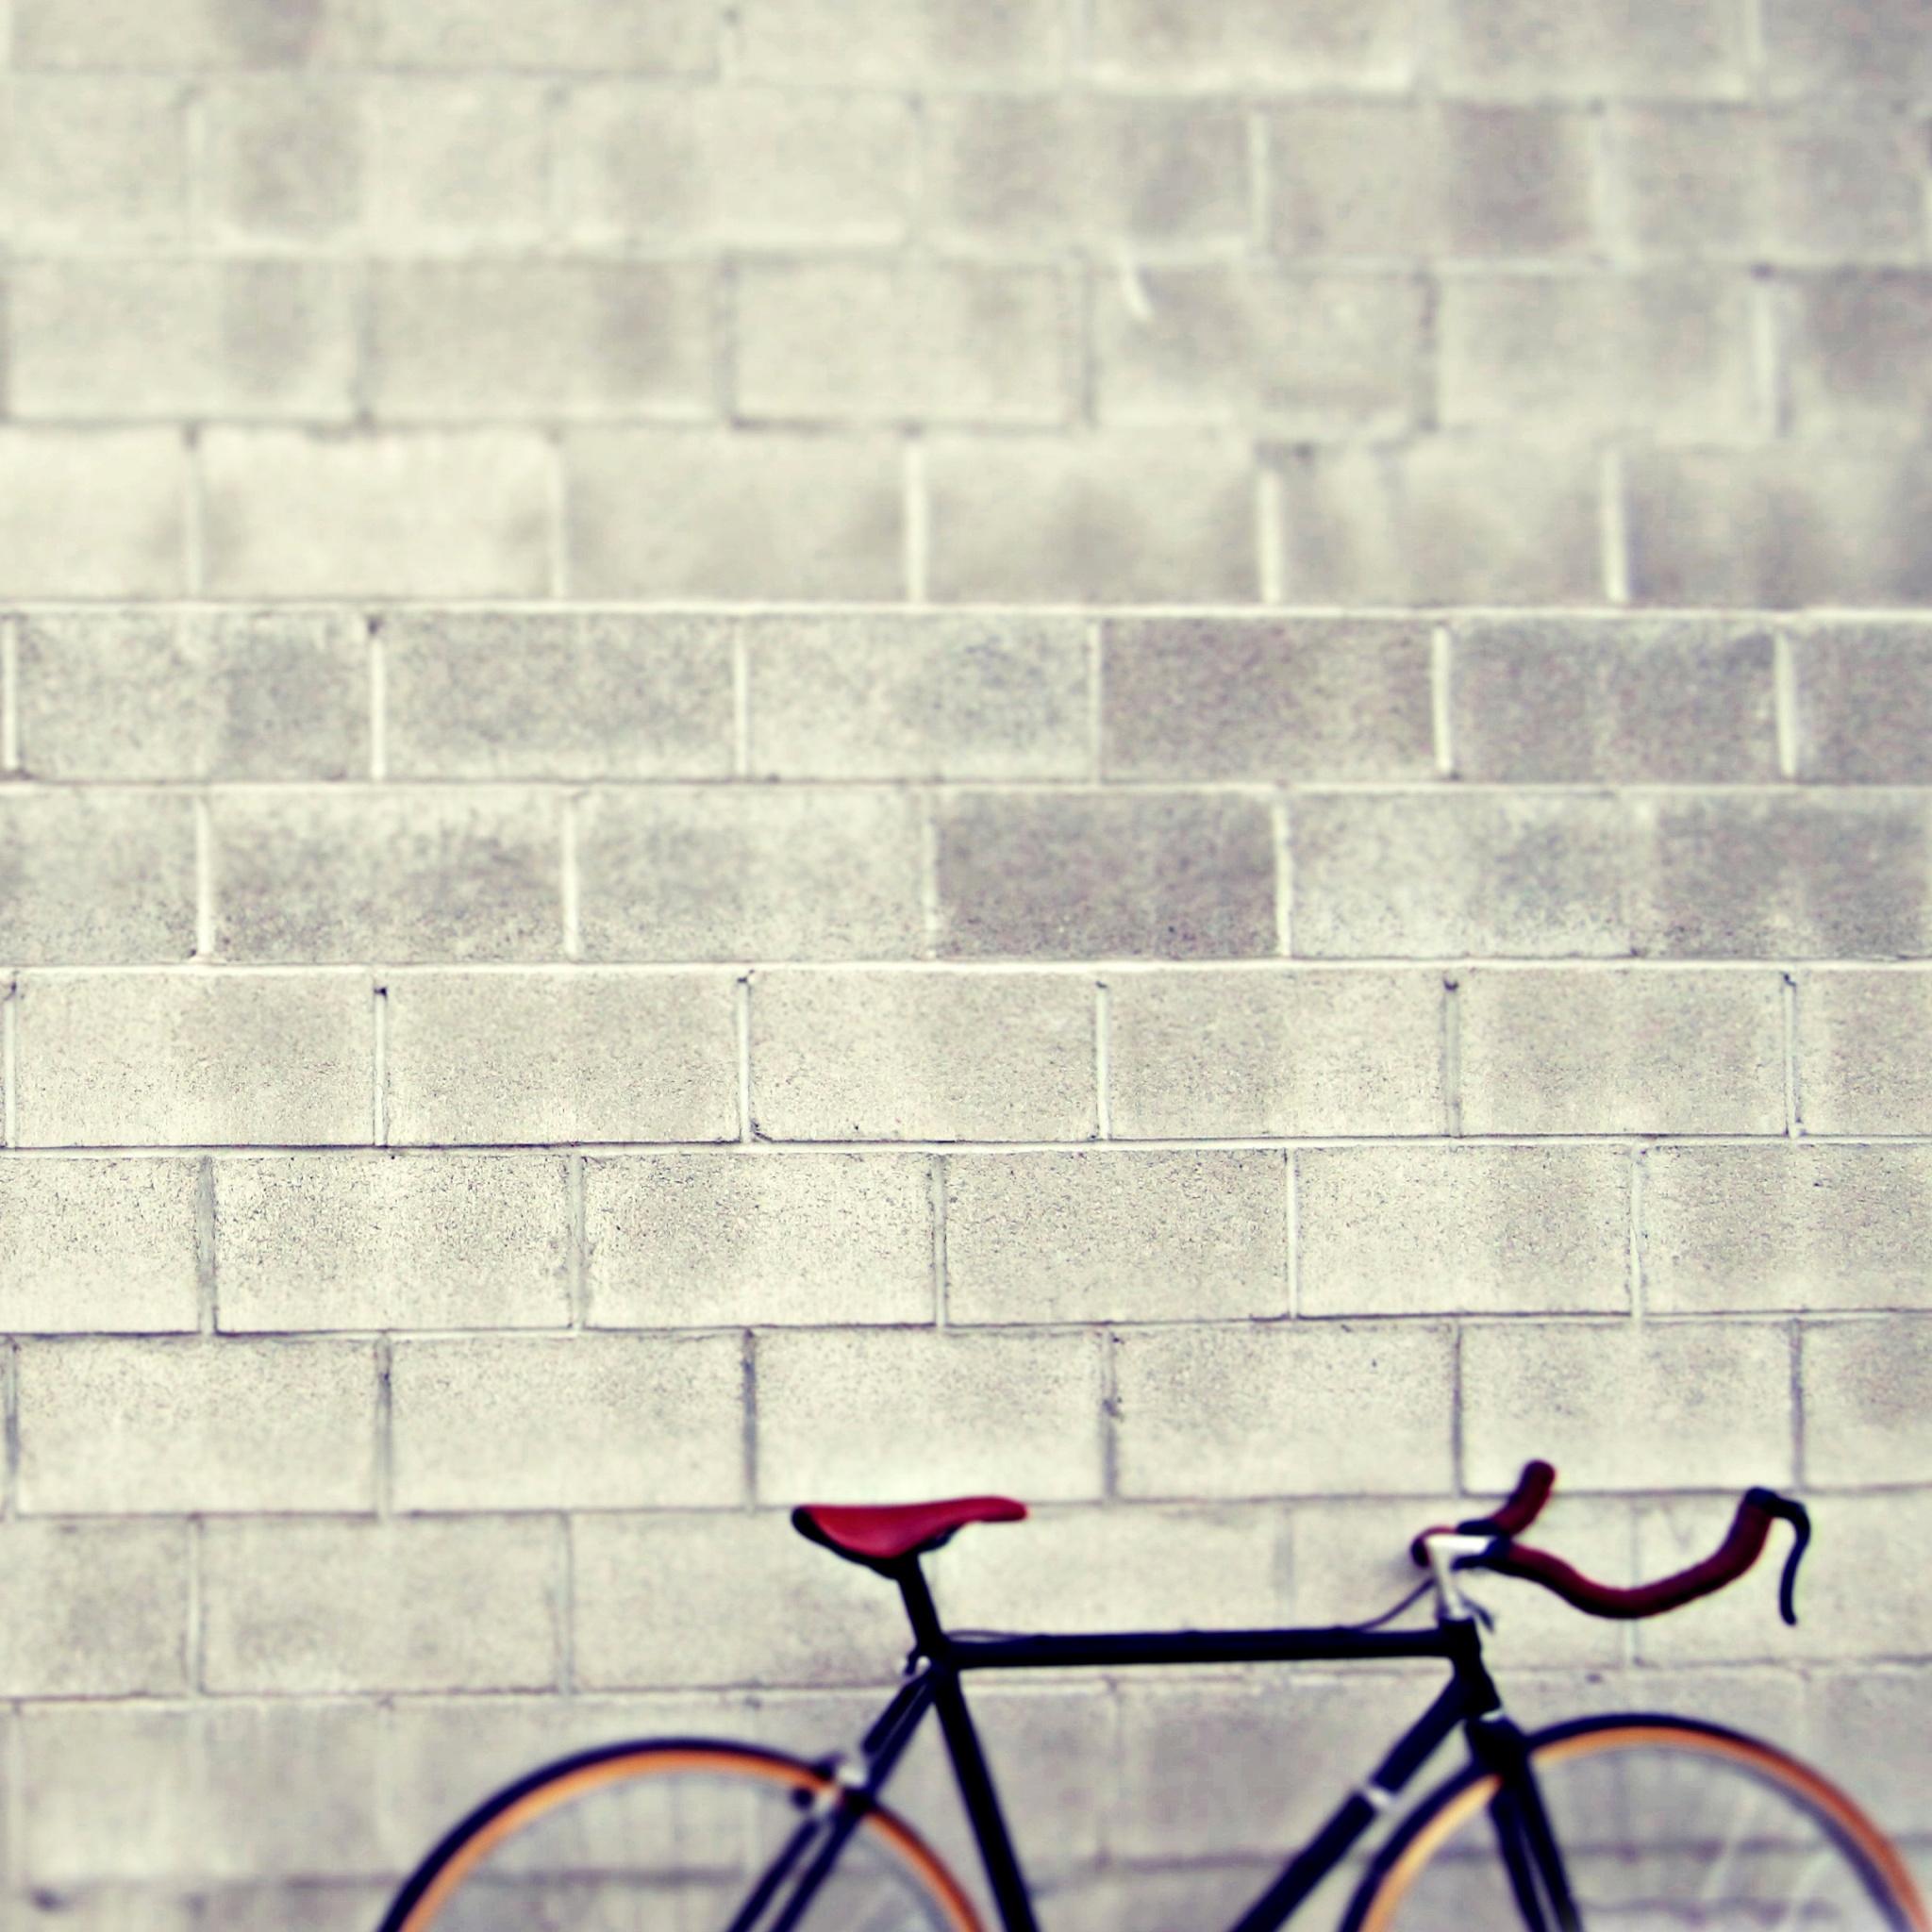 Schwinn-Bicycle3Wallpapers-iPad-Retina